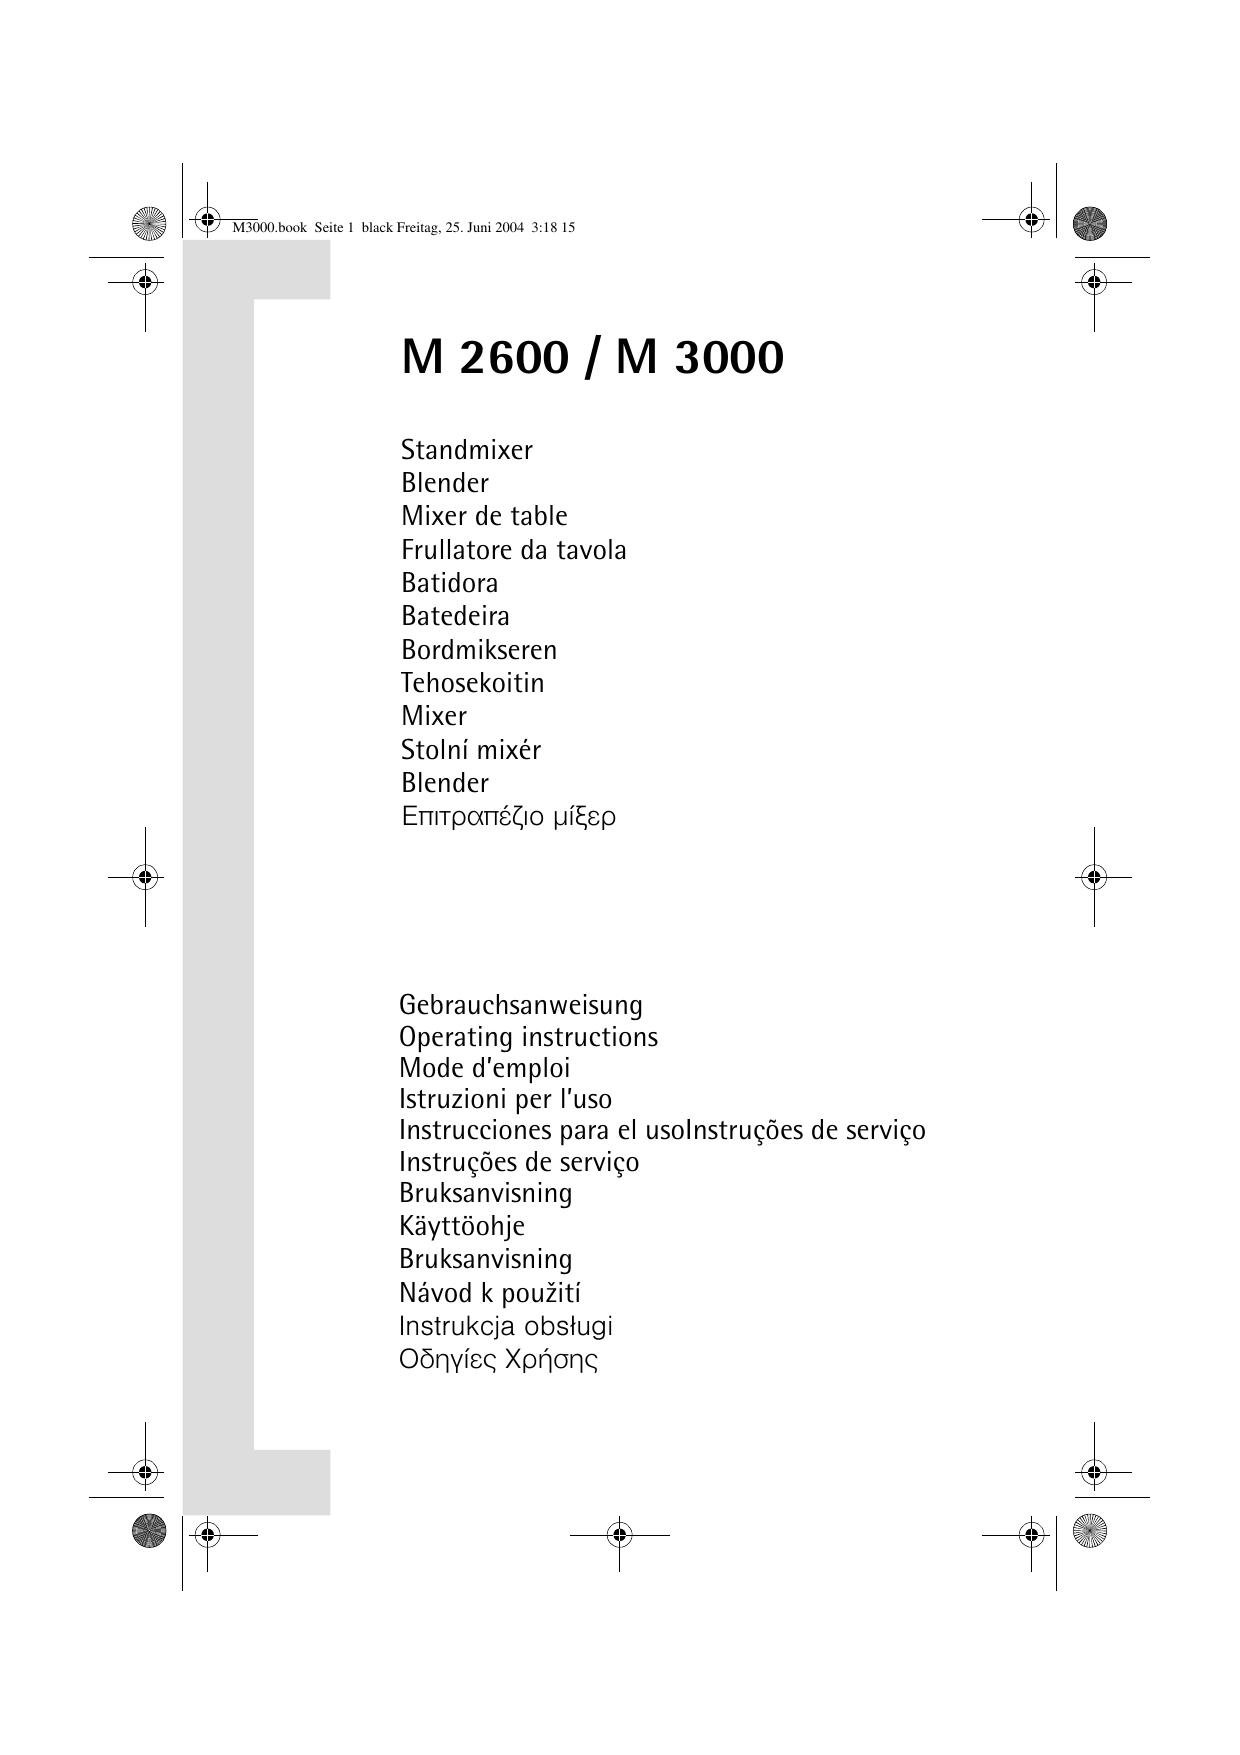 Charmant Aeg M3000 User Manual